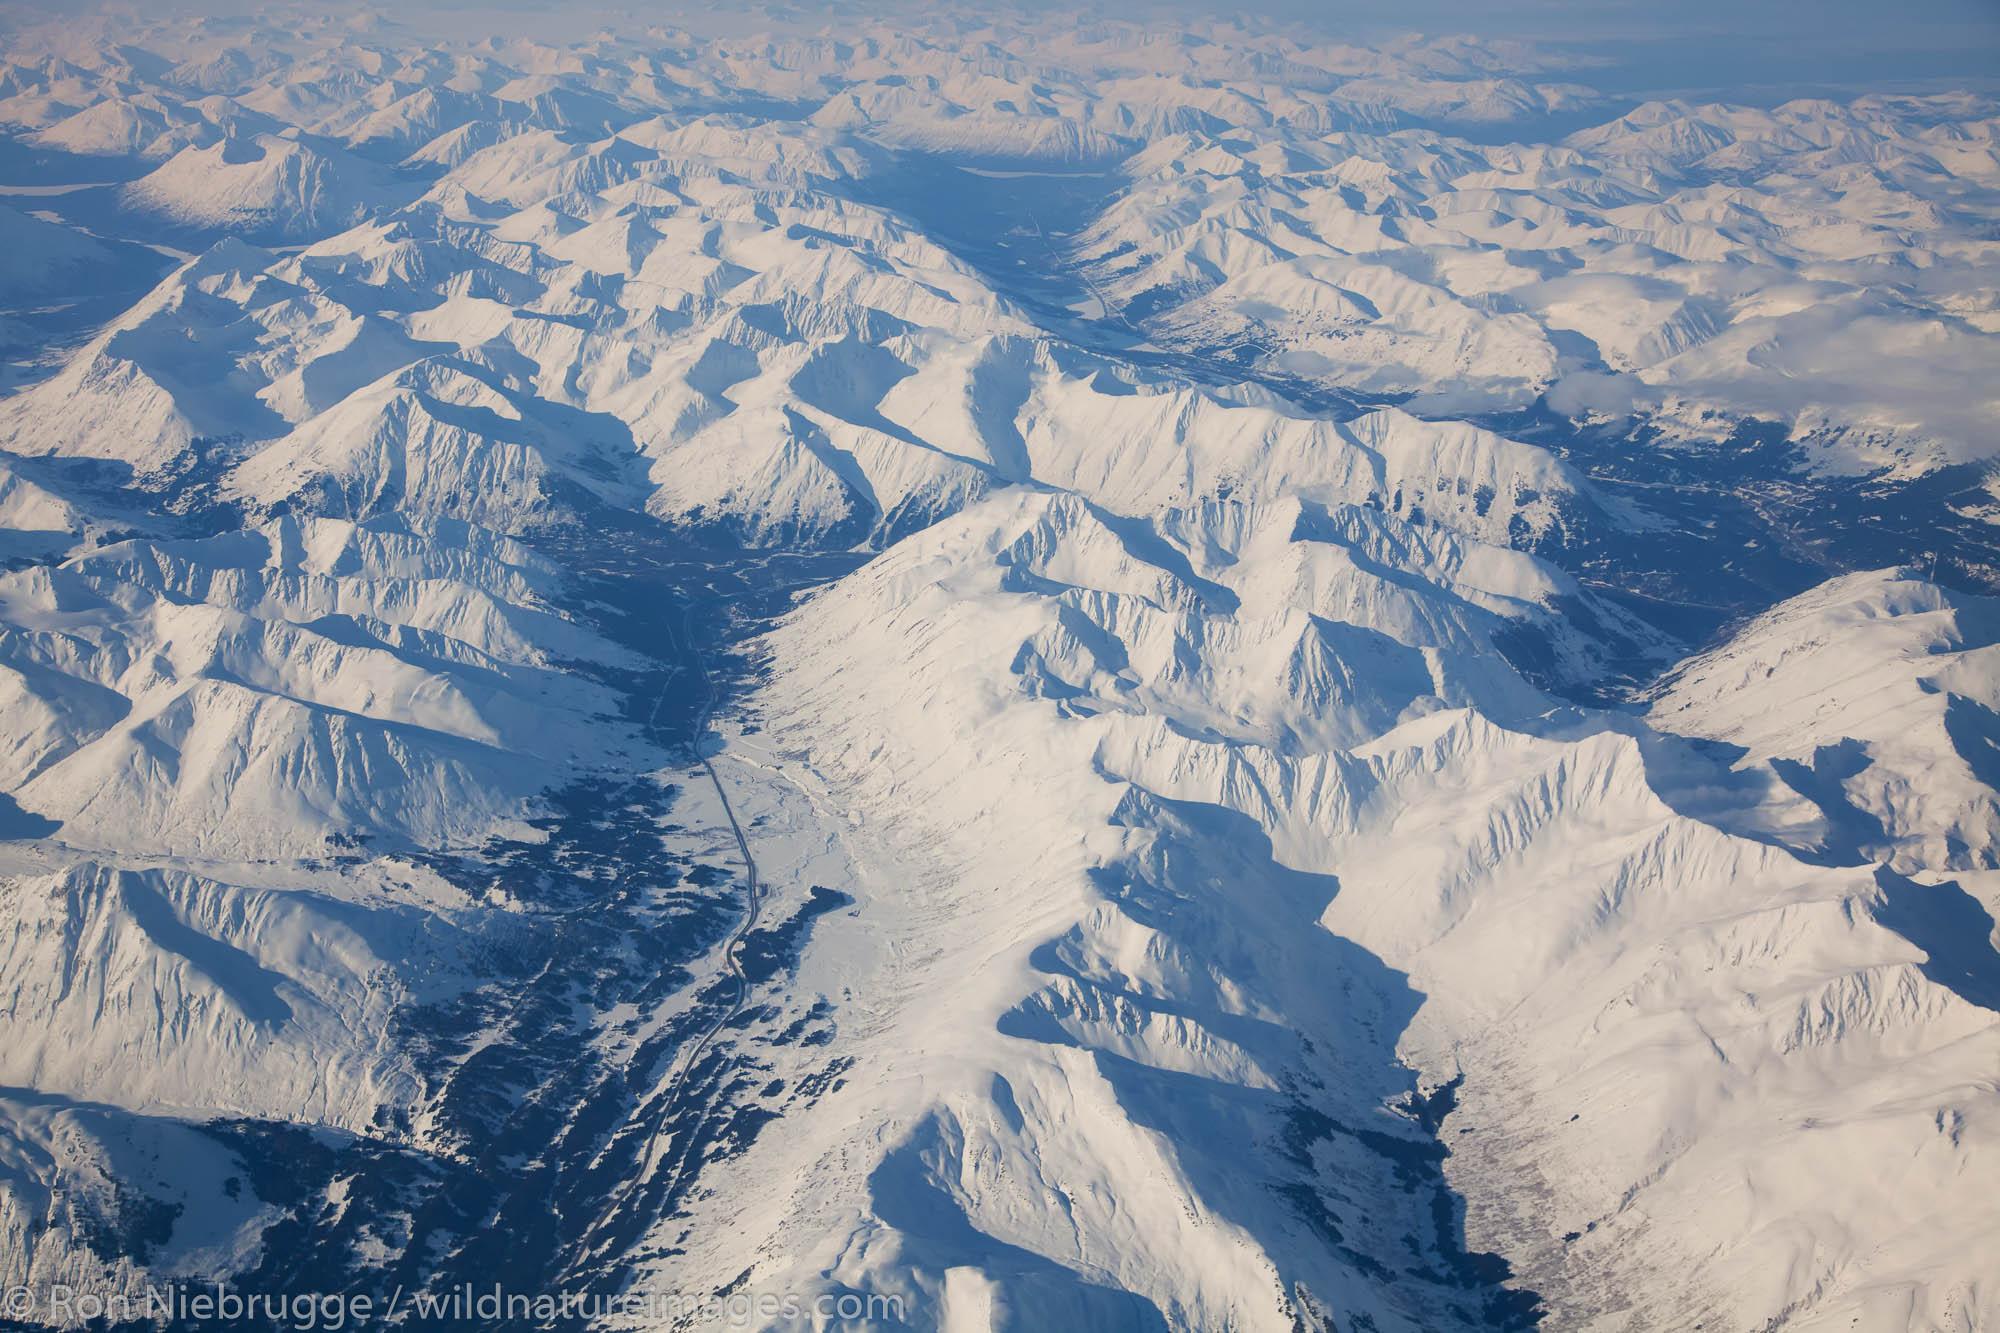 Aerial over Chugach National Forest, Alaska.